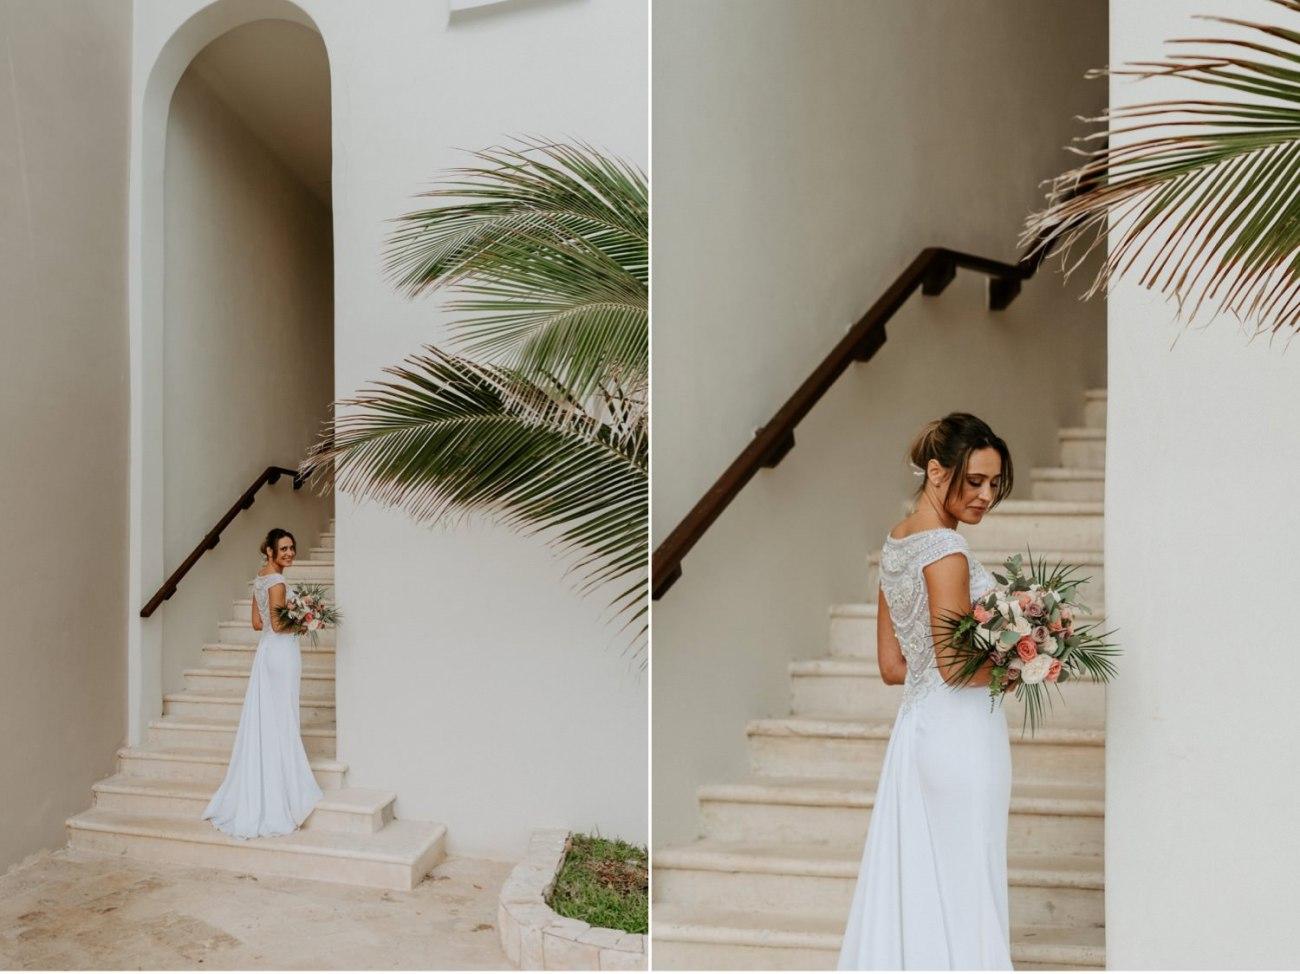 Cancun Destination Wedding Mexico Tulum Wedding Photographer Anais Possamai Photography 050